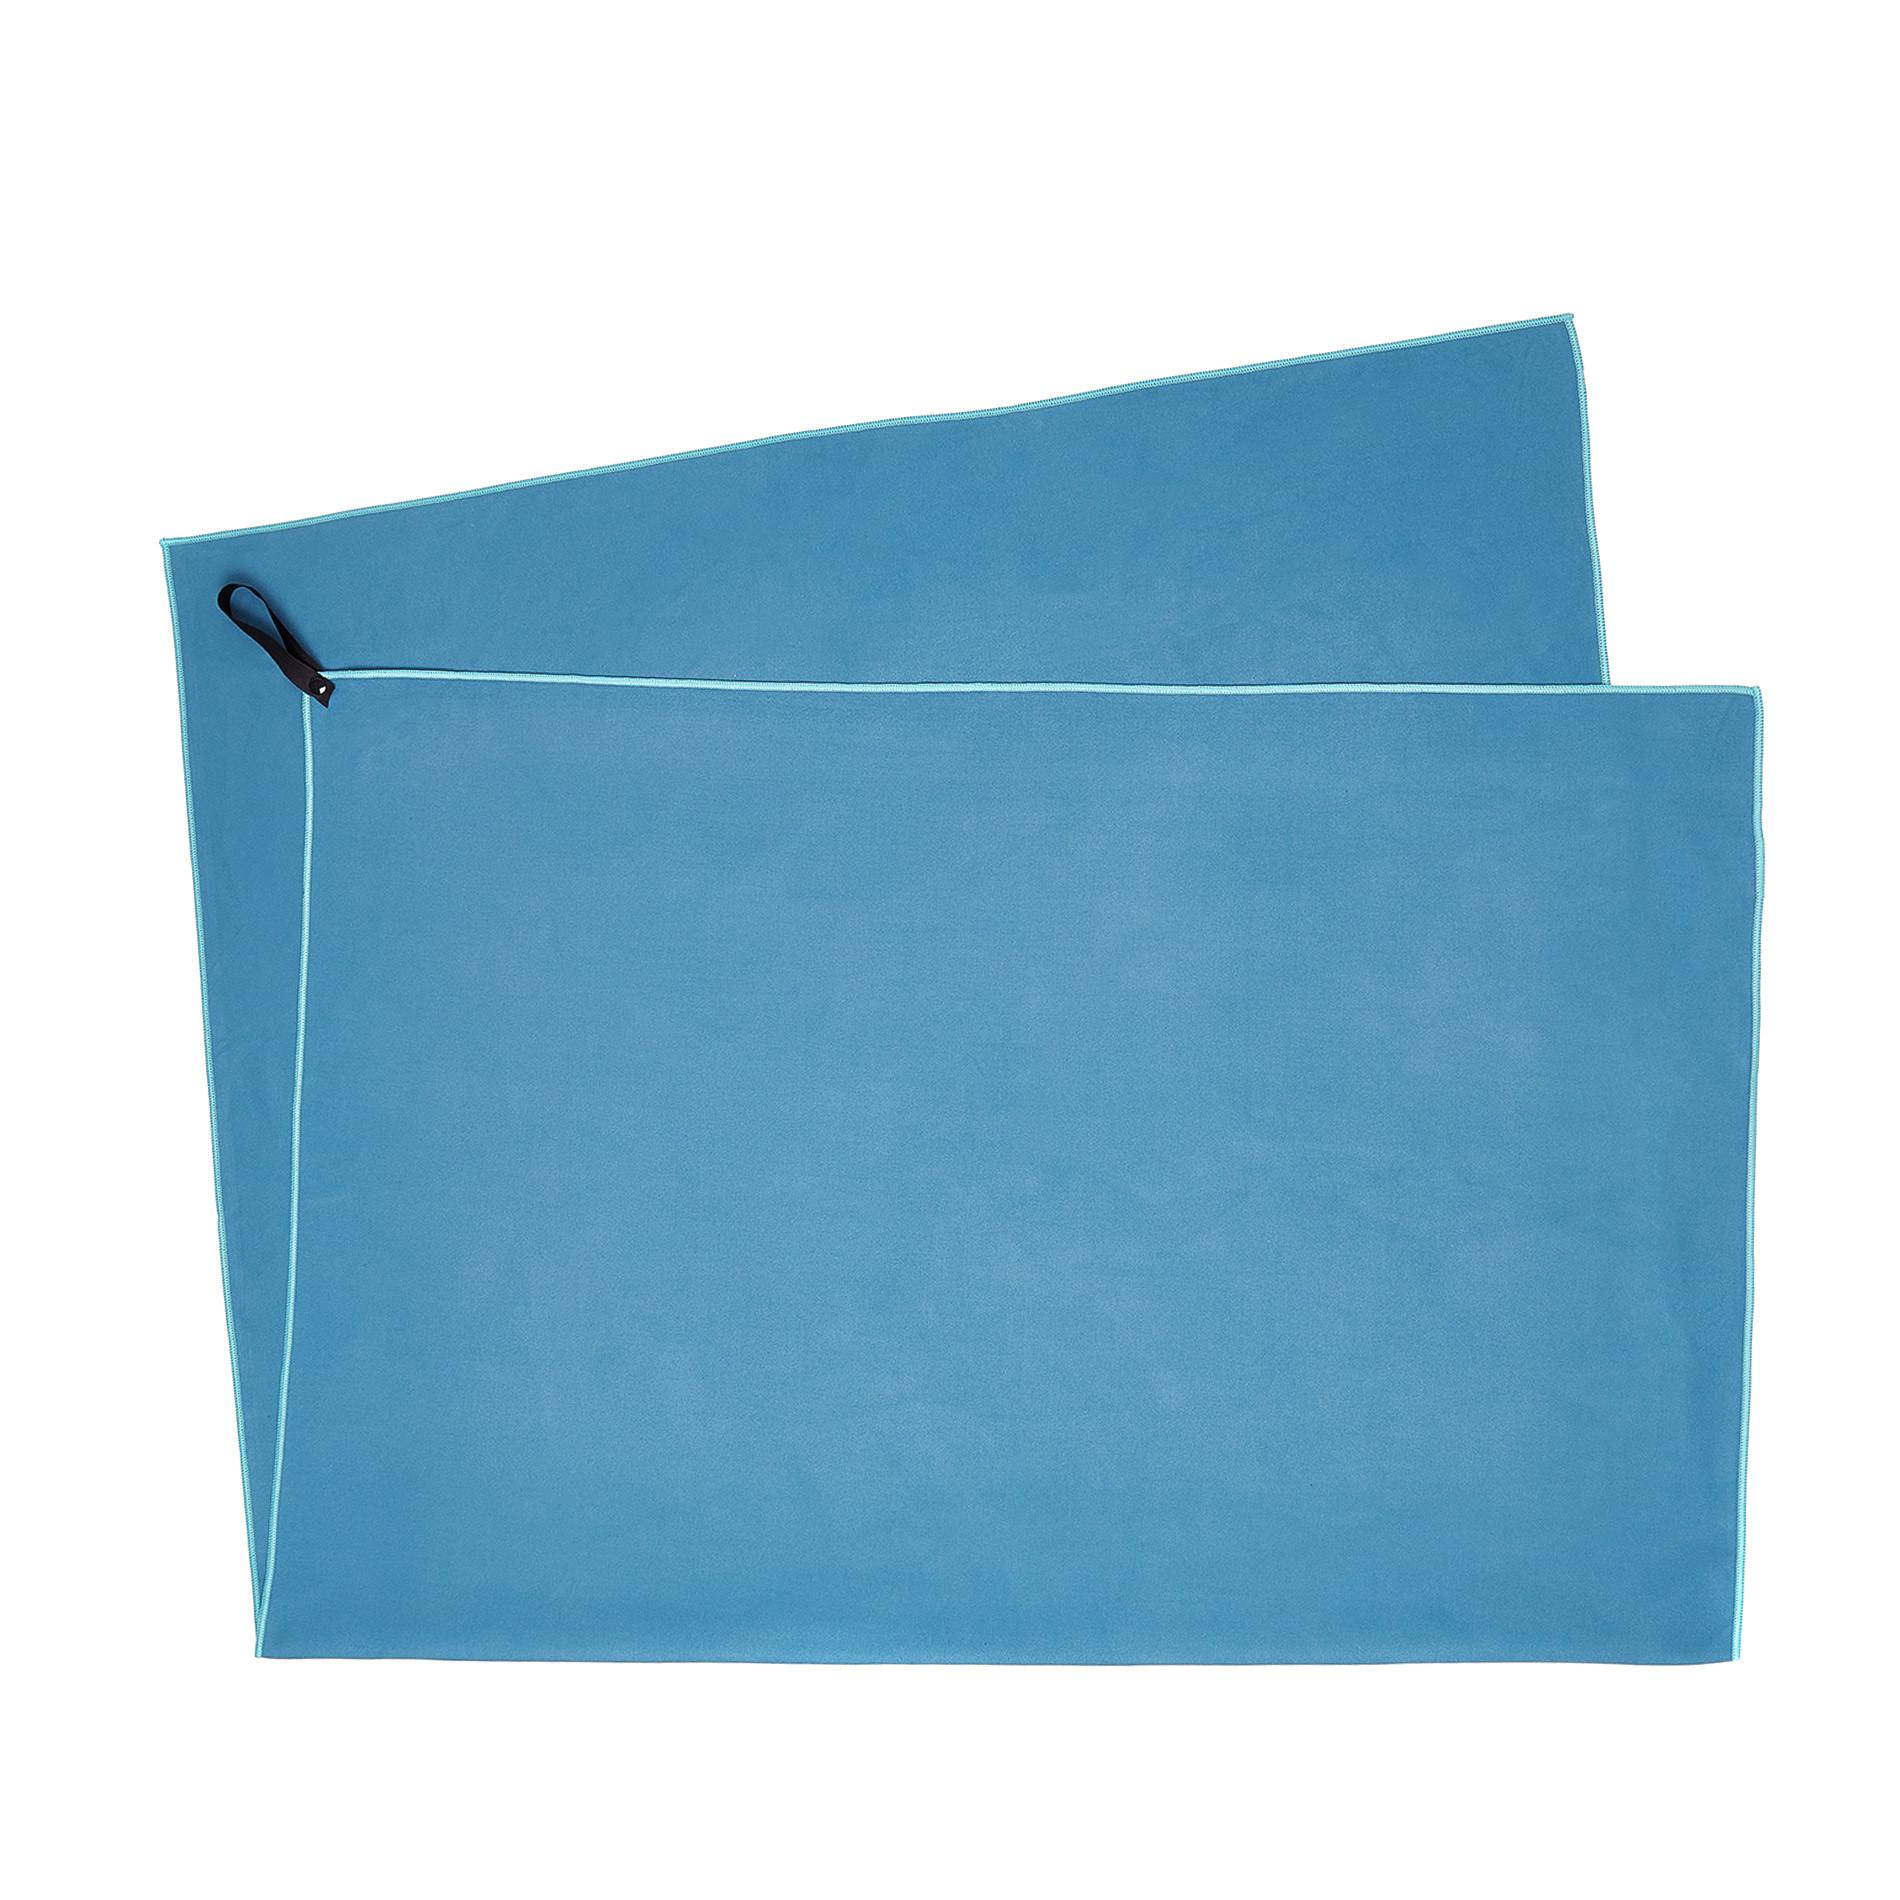 Telo bagno microfibra tinta unita, Blu, large image number 1